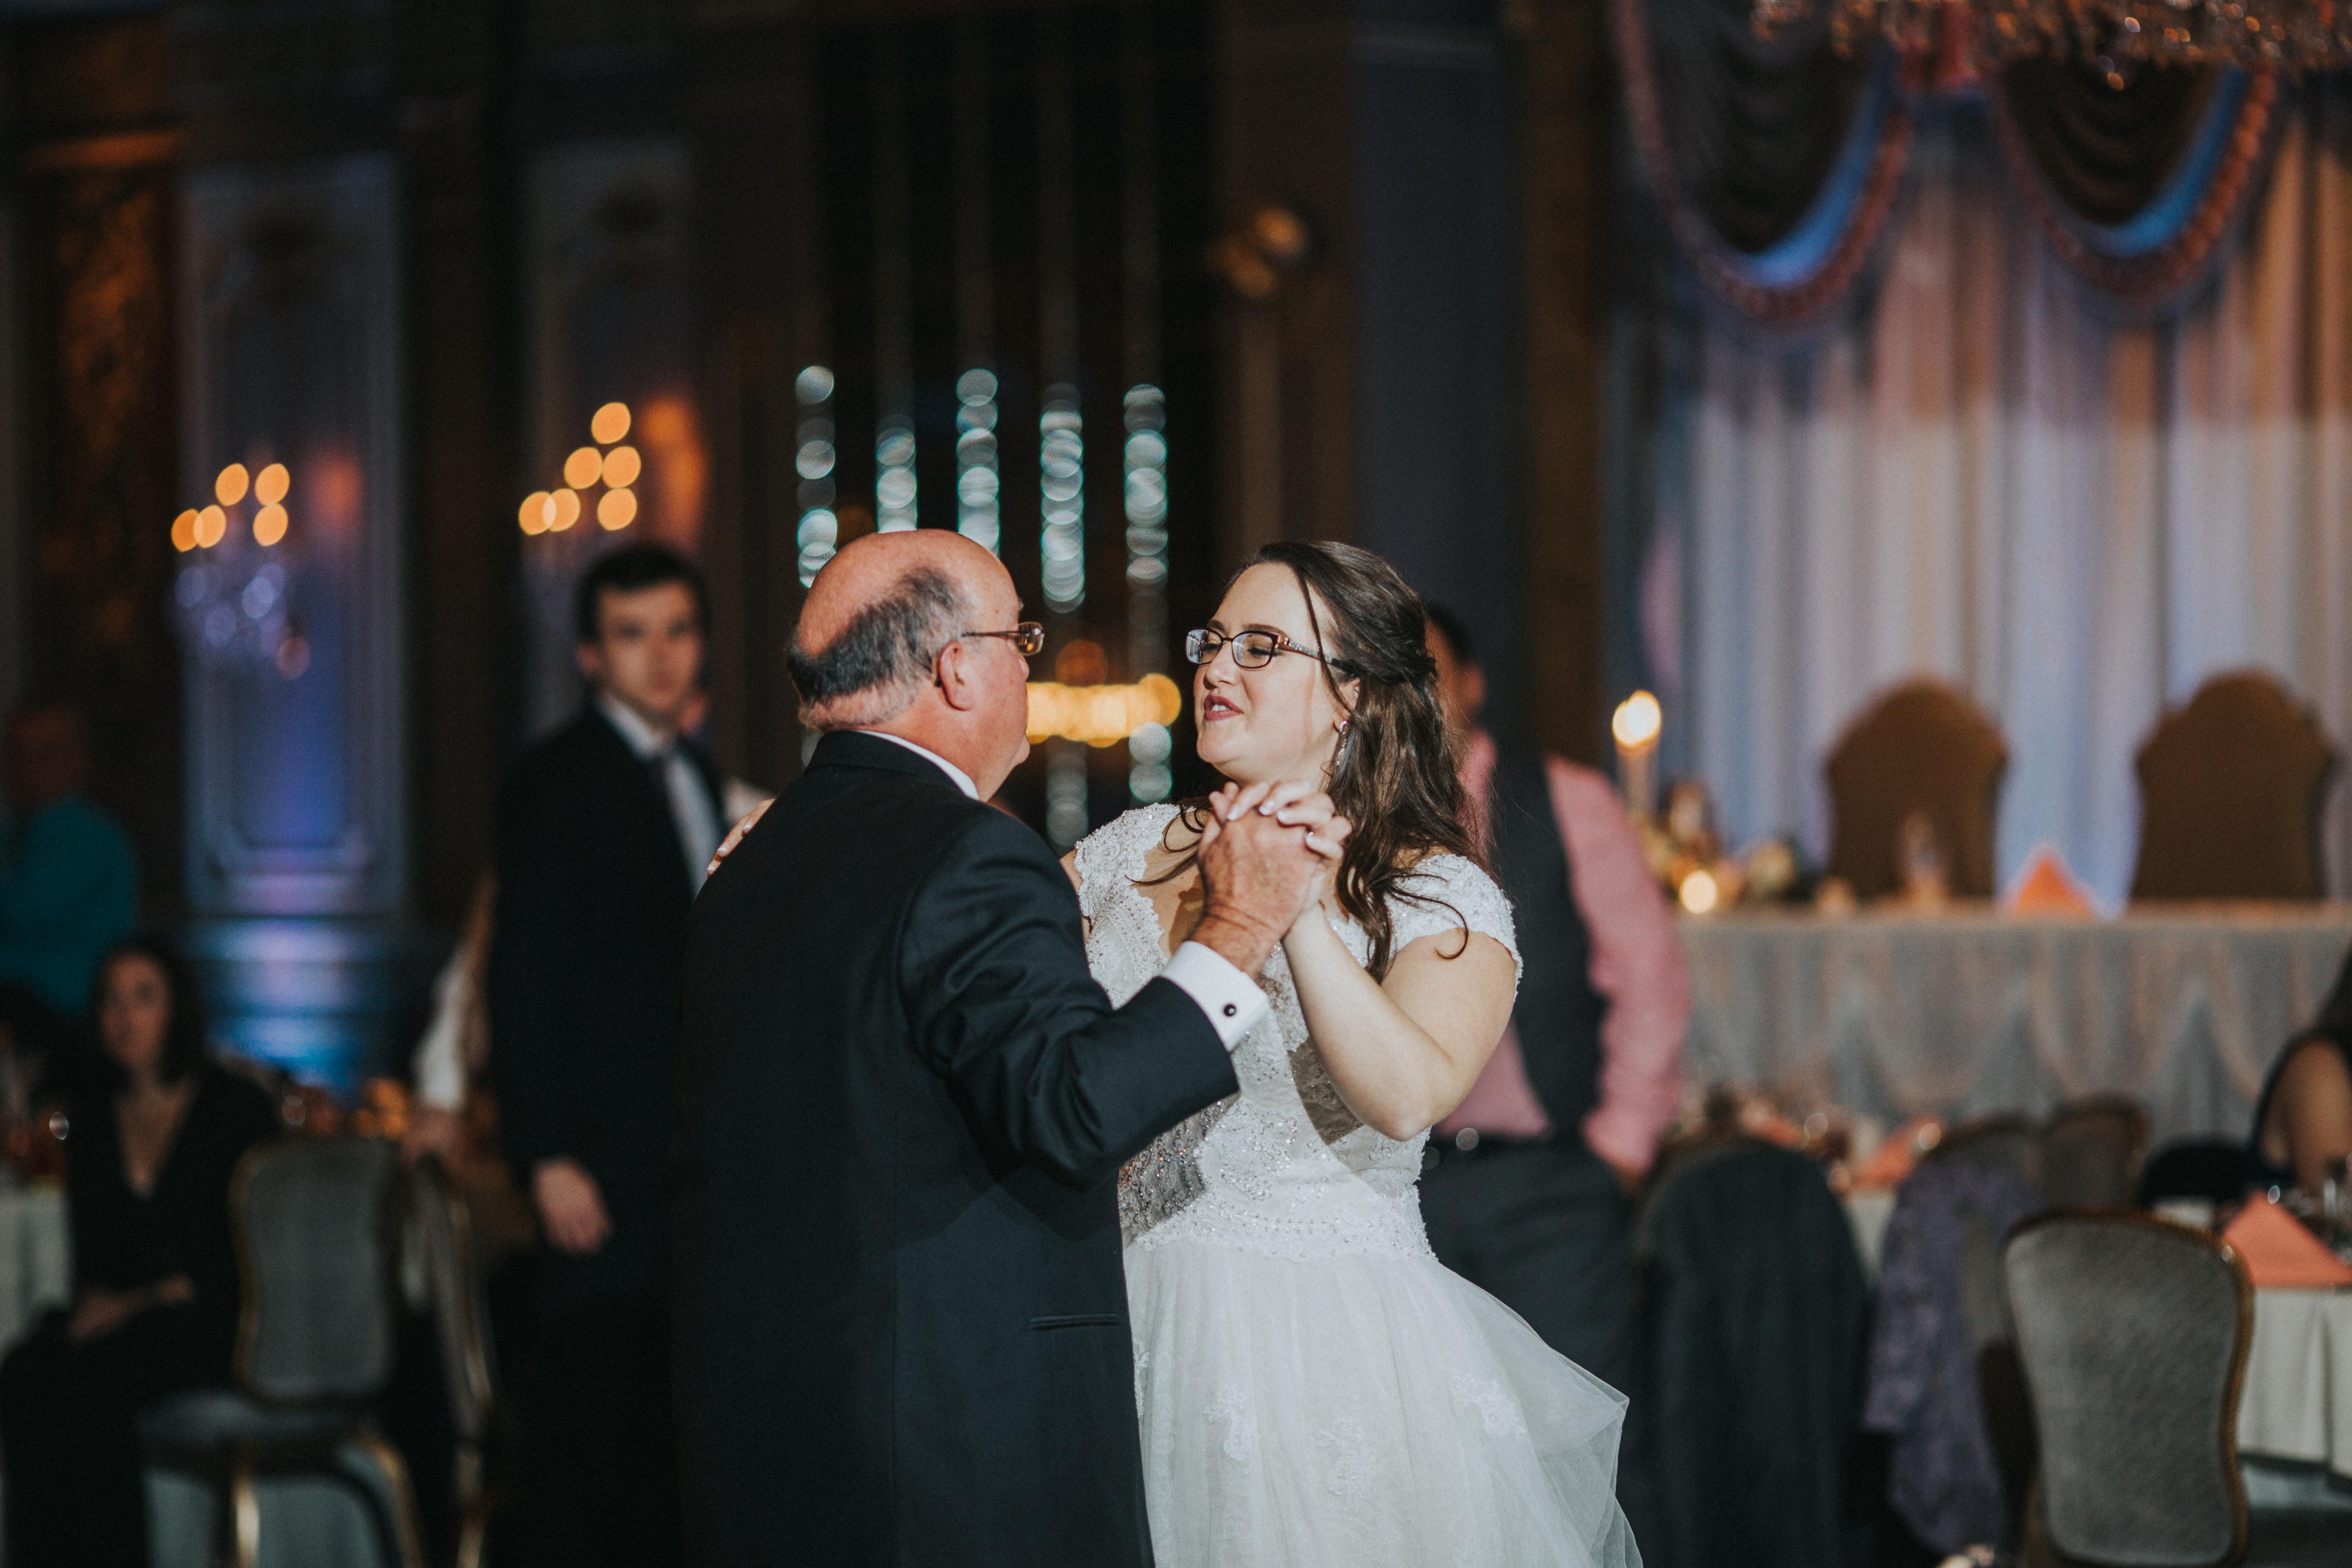 New-Jersey-Wedding-Photography-Fishers-Tudor-House-JennaLynnPhotography-Reception-Kathleen&Eddie-32.jpg